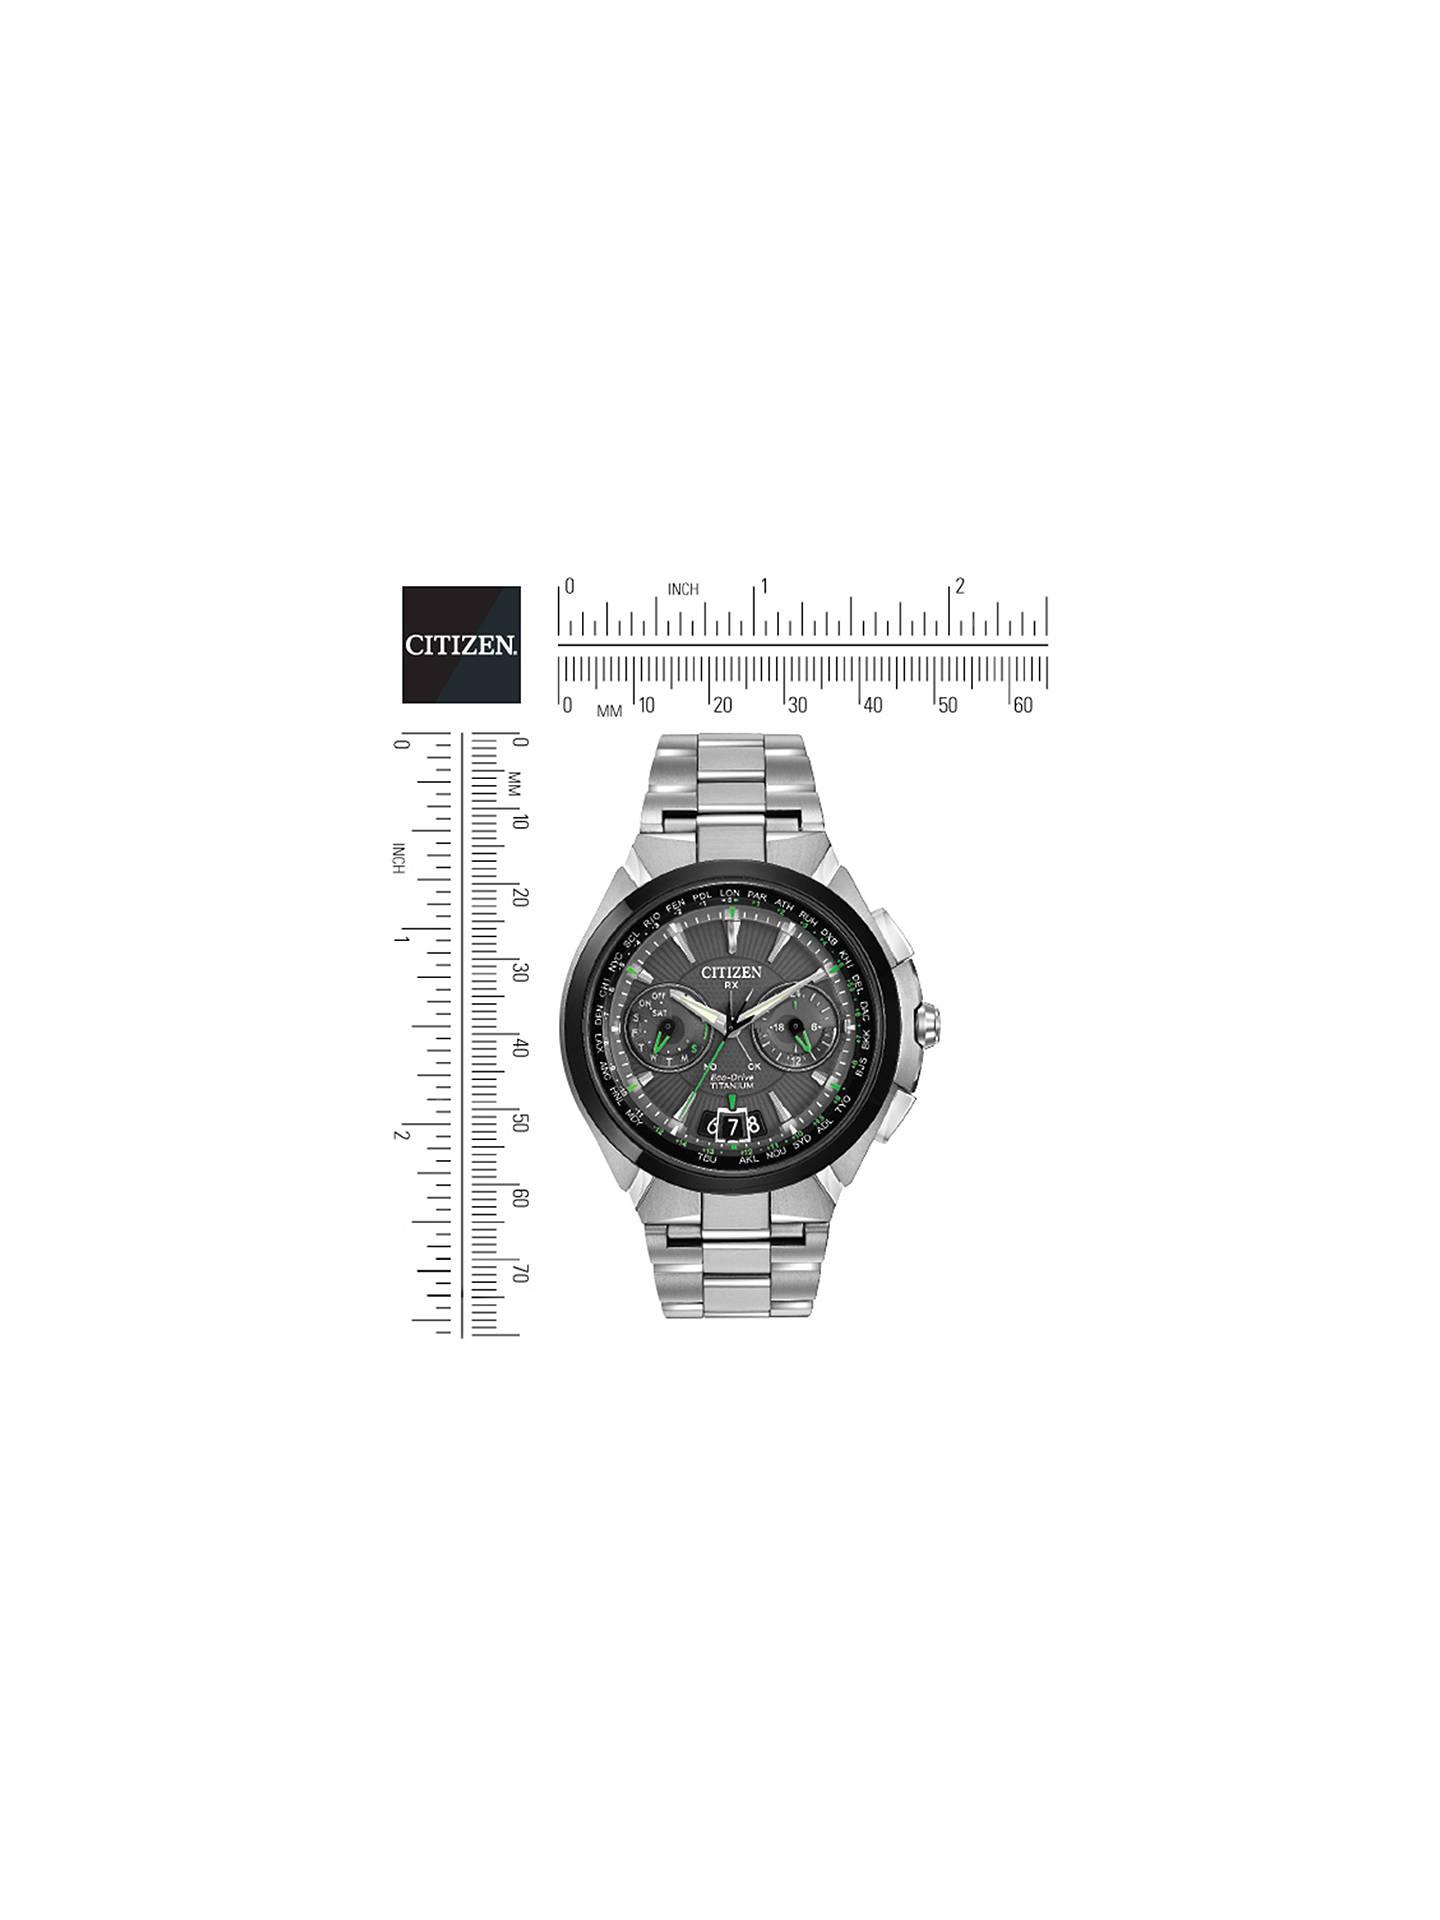 Citizen Satellite Wave CC1084-63E Men's Chronograph Eco